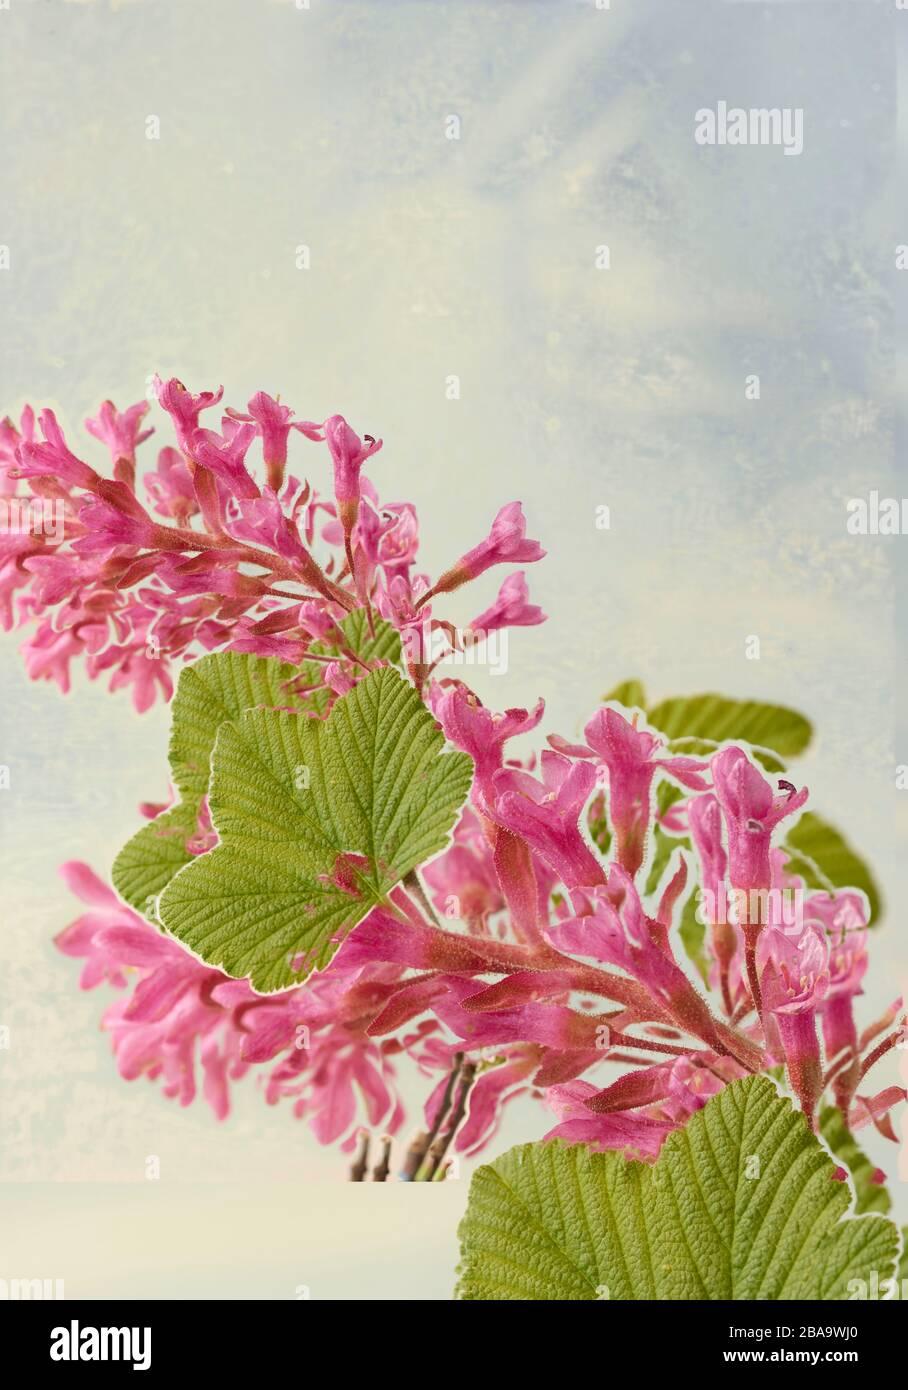 Ribes Sanguineum, flowering currant, nature flower portrait Stock Photo